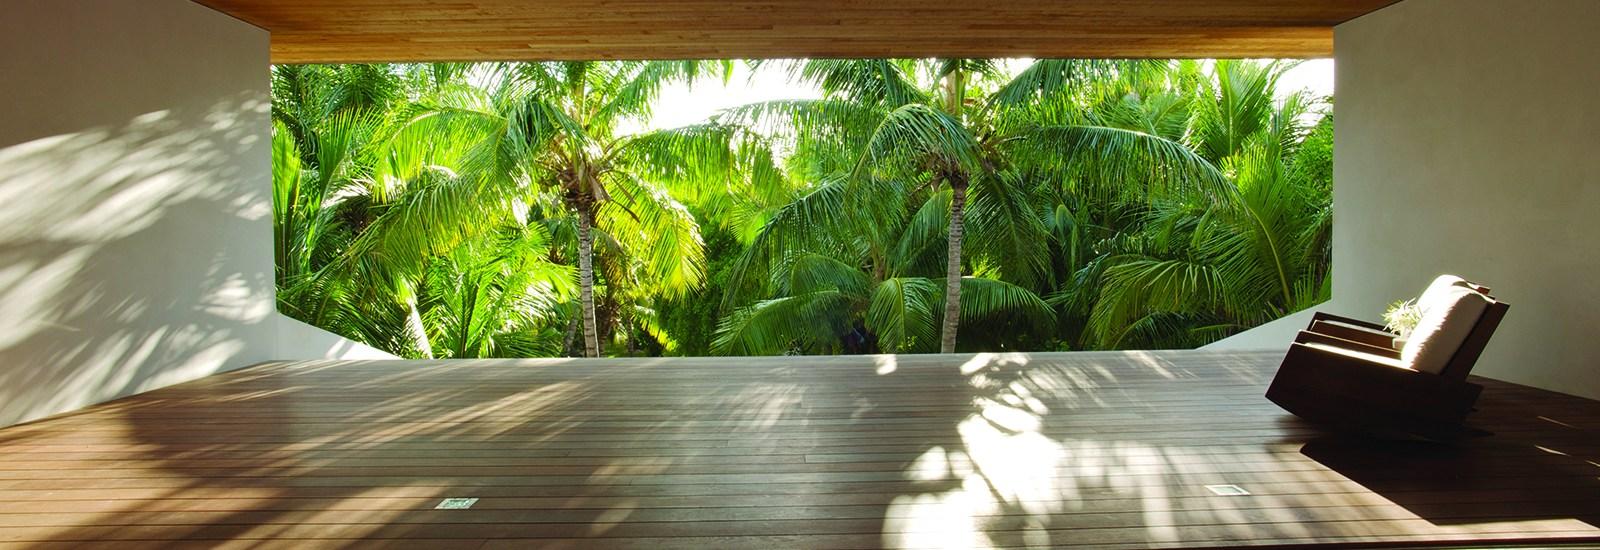 House dune Bahamas Chad Oppenheim